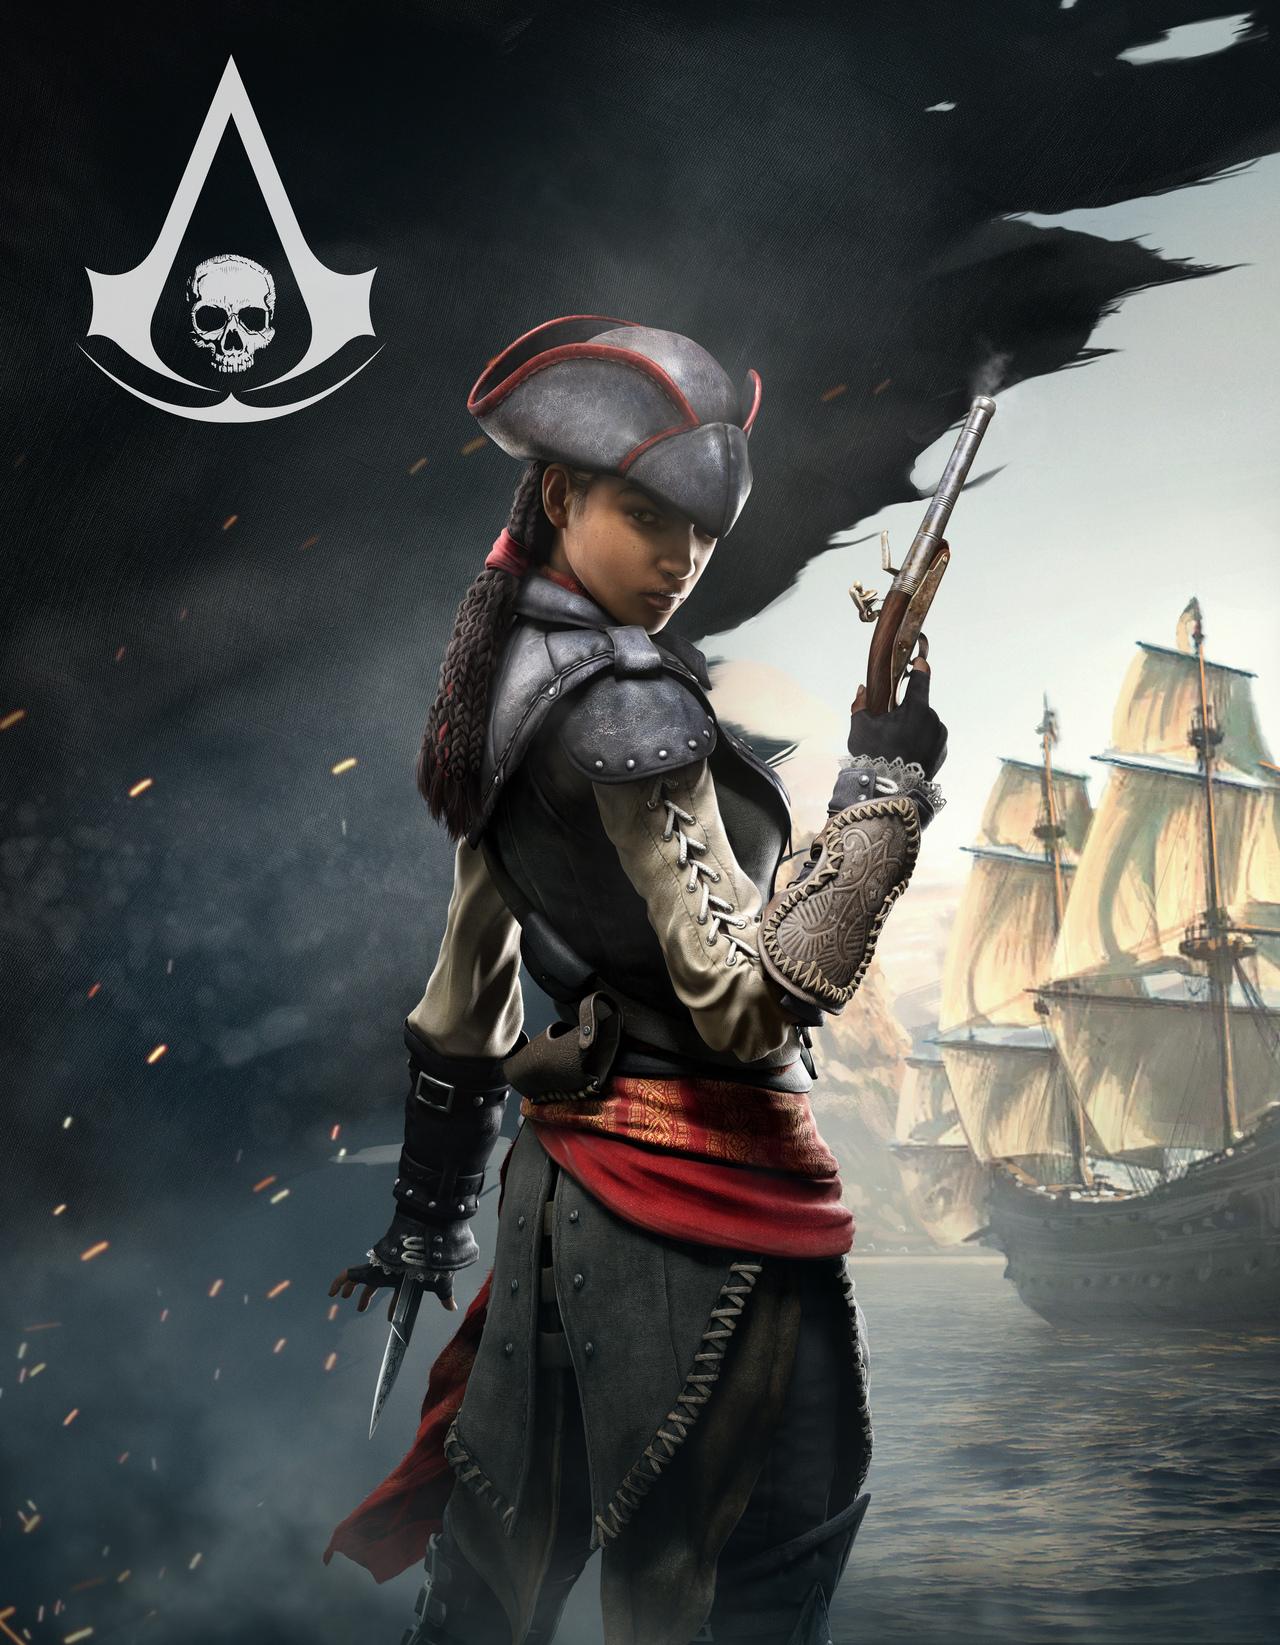 assassin-s-creed-iv-black-flag-playstation-4-ps4-1370959035-046.jpg